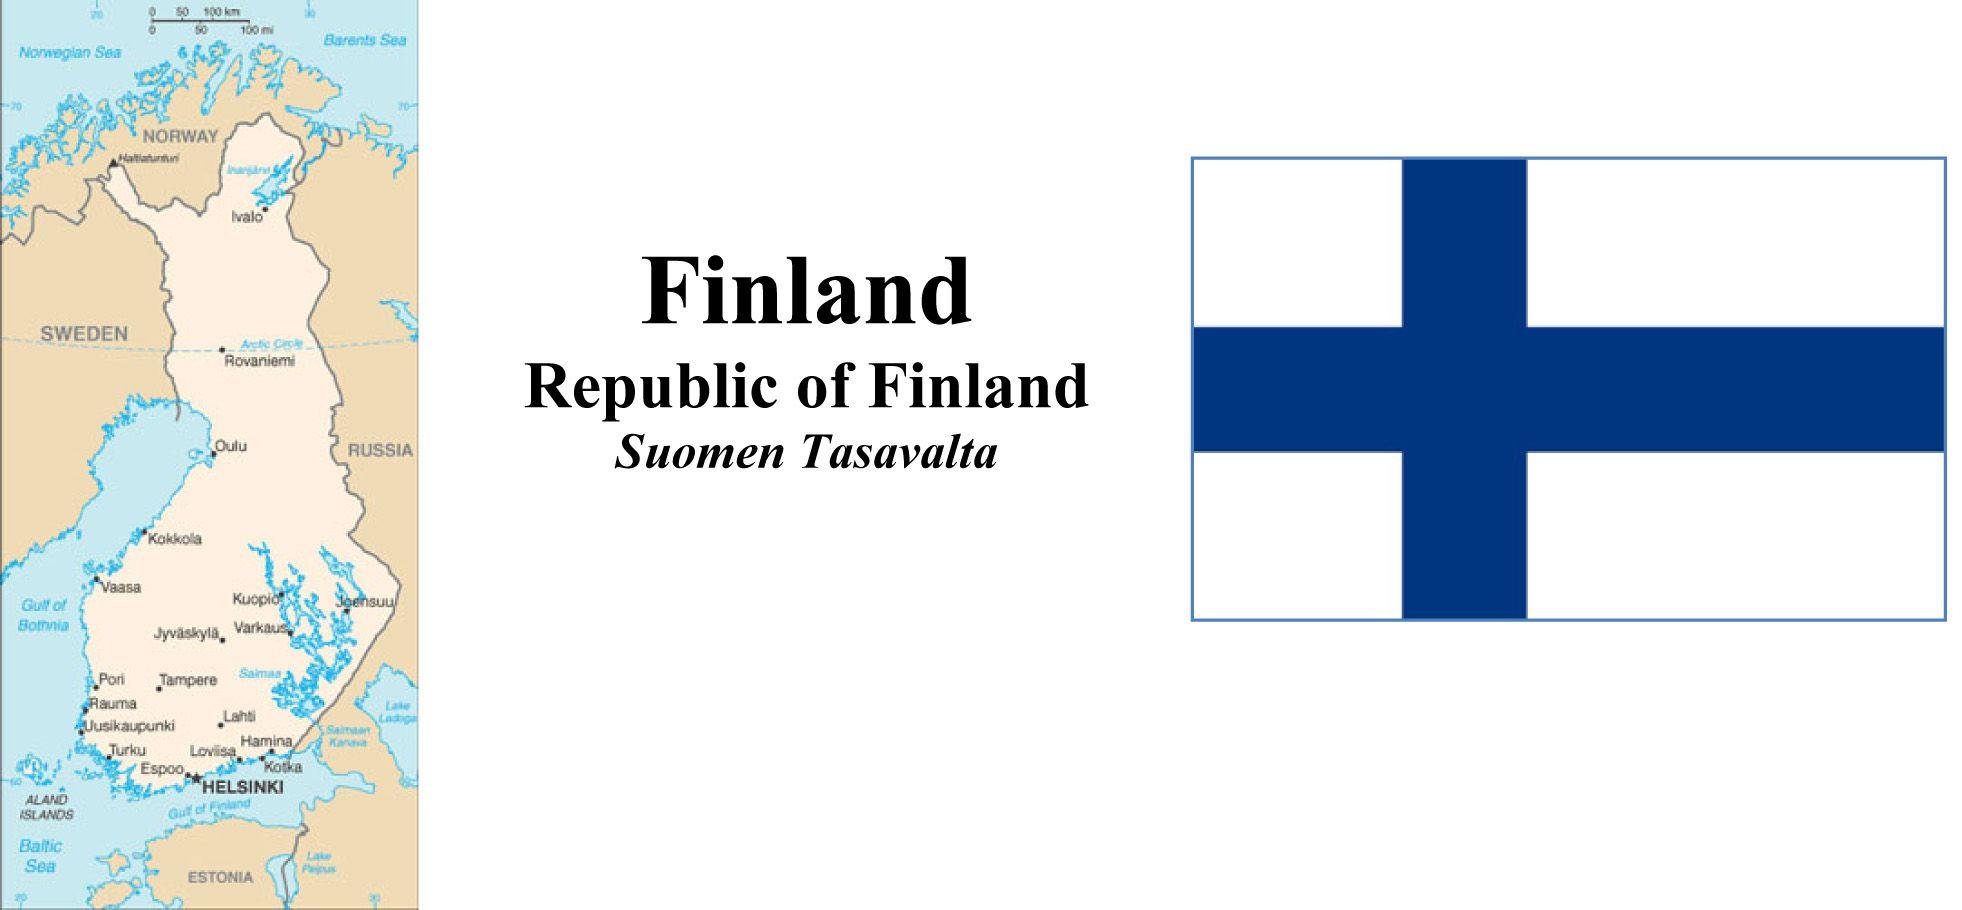 Map and Flga of Finland